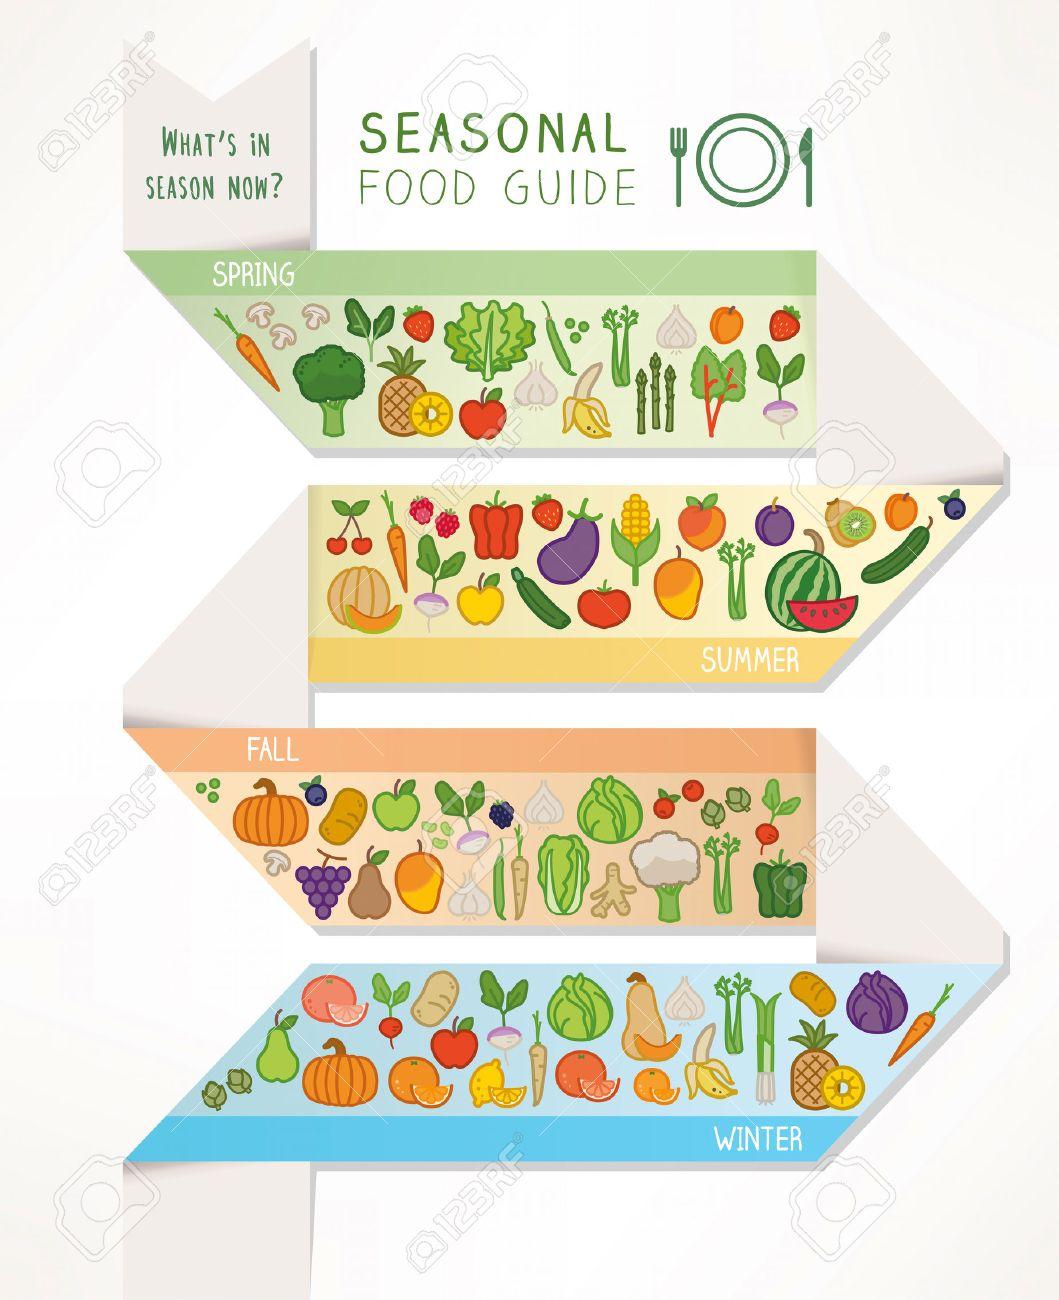 Seasonal produce guide free downloadable pdf ebook.